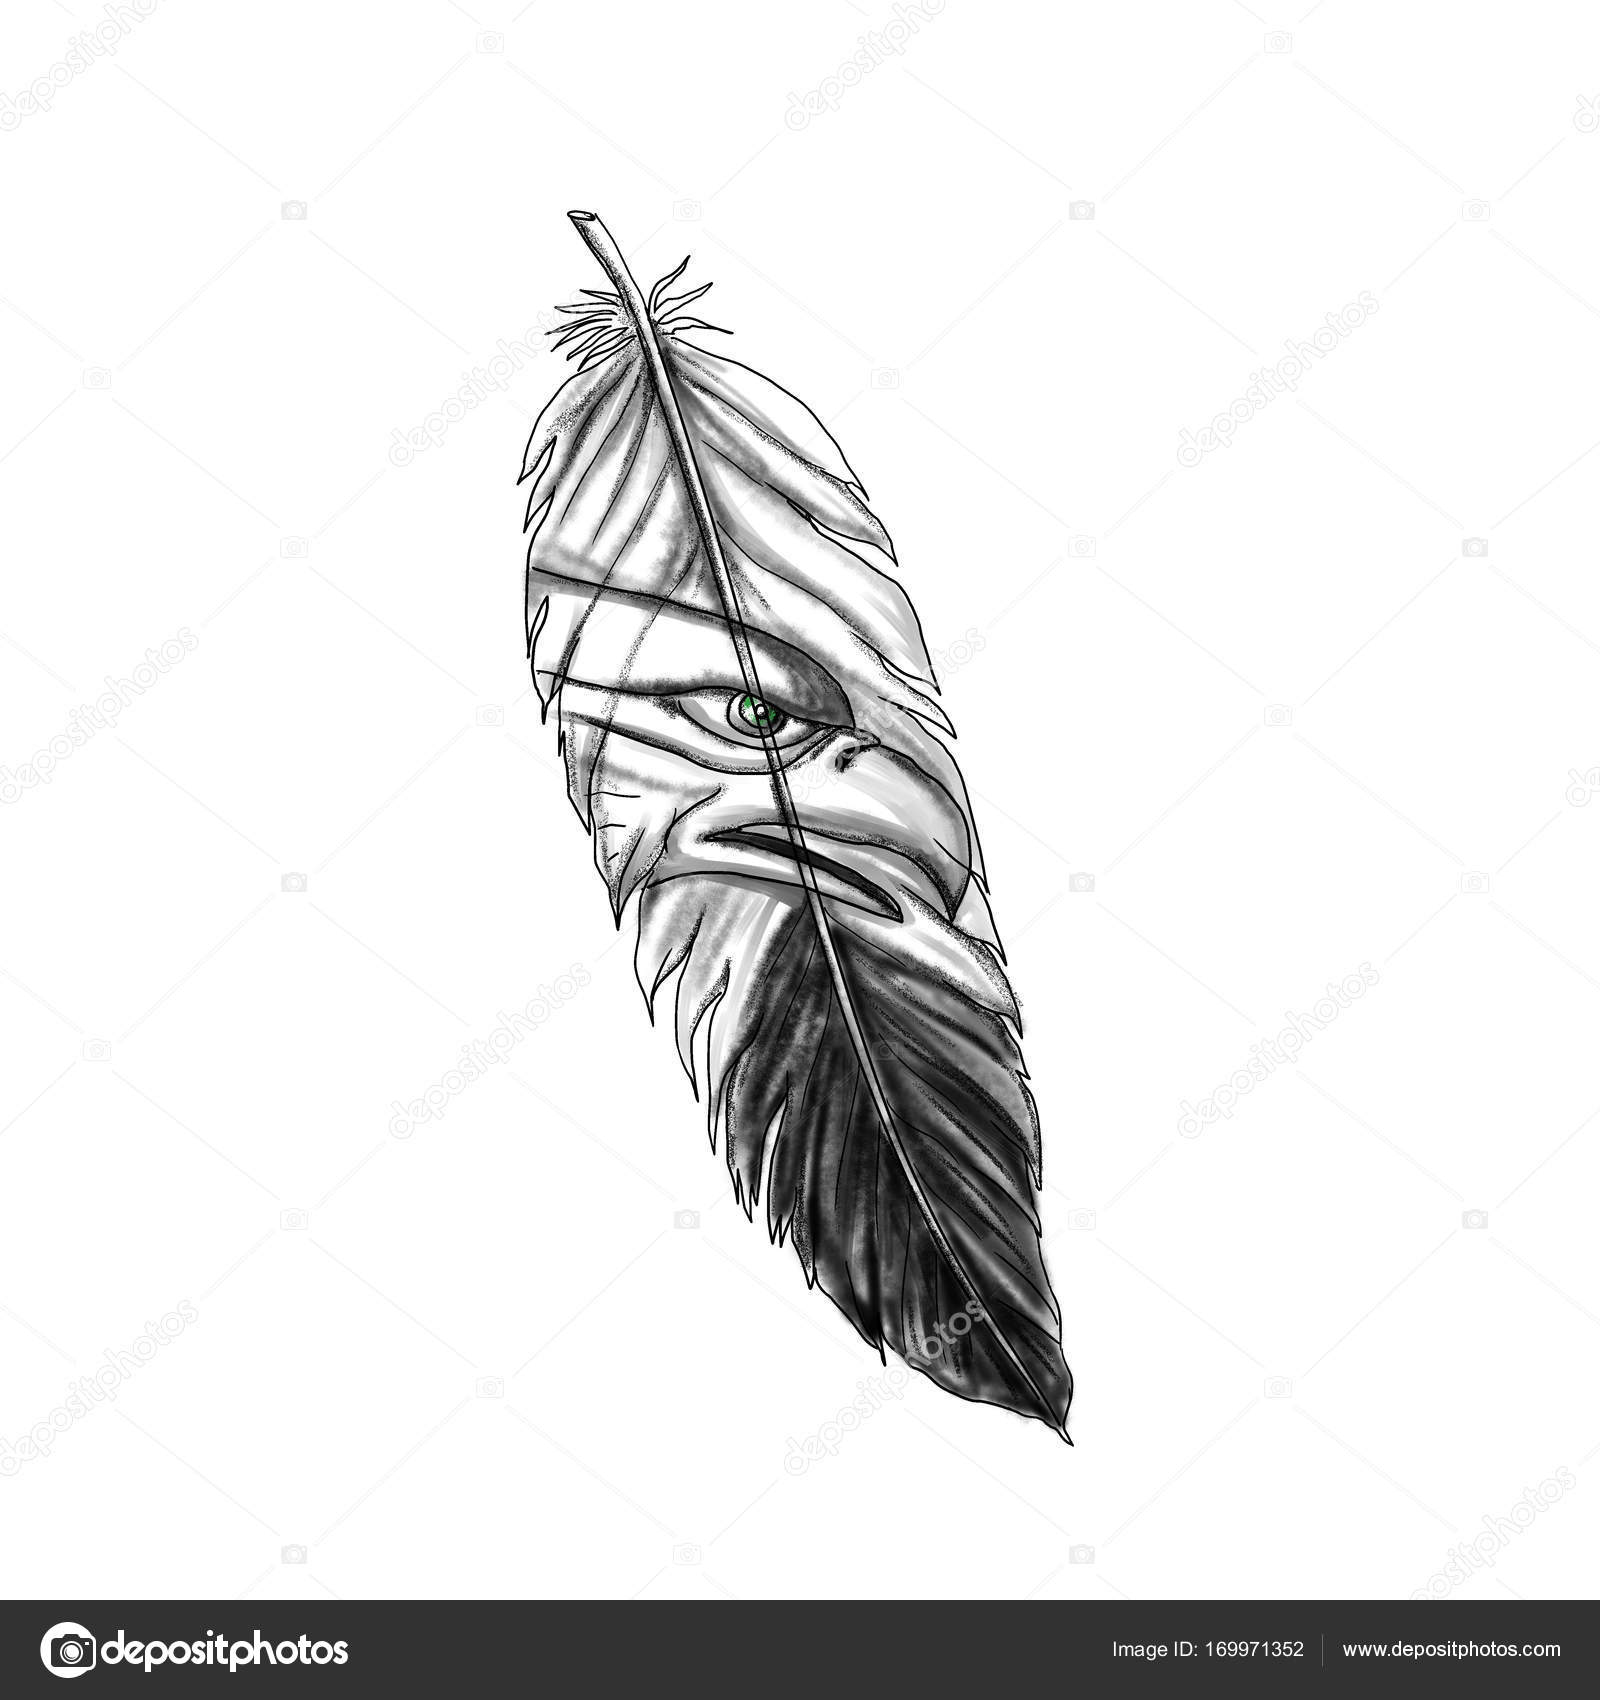 Tattoo Flash Wallpaper By Feathr: Stock Photo © Patrimonio #169971352